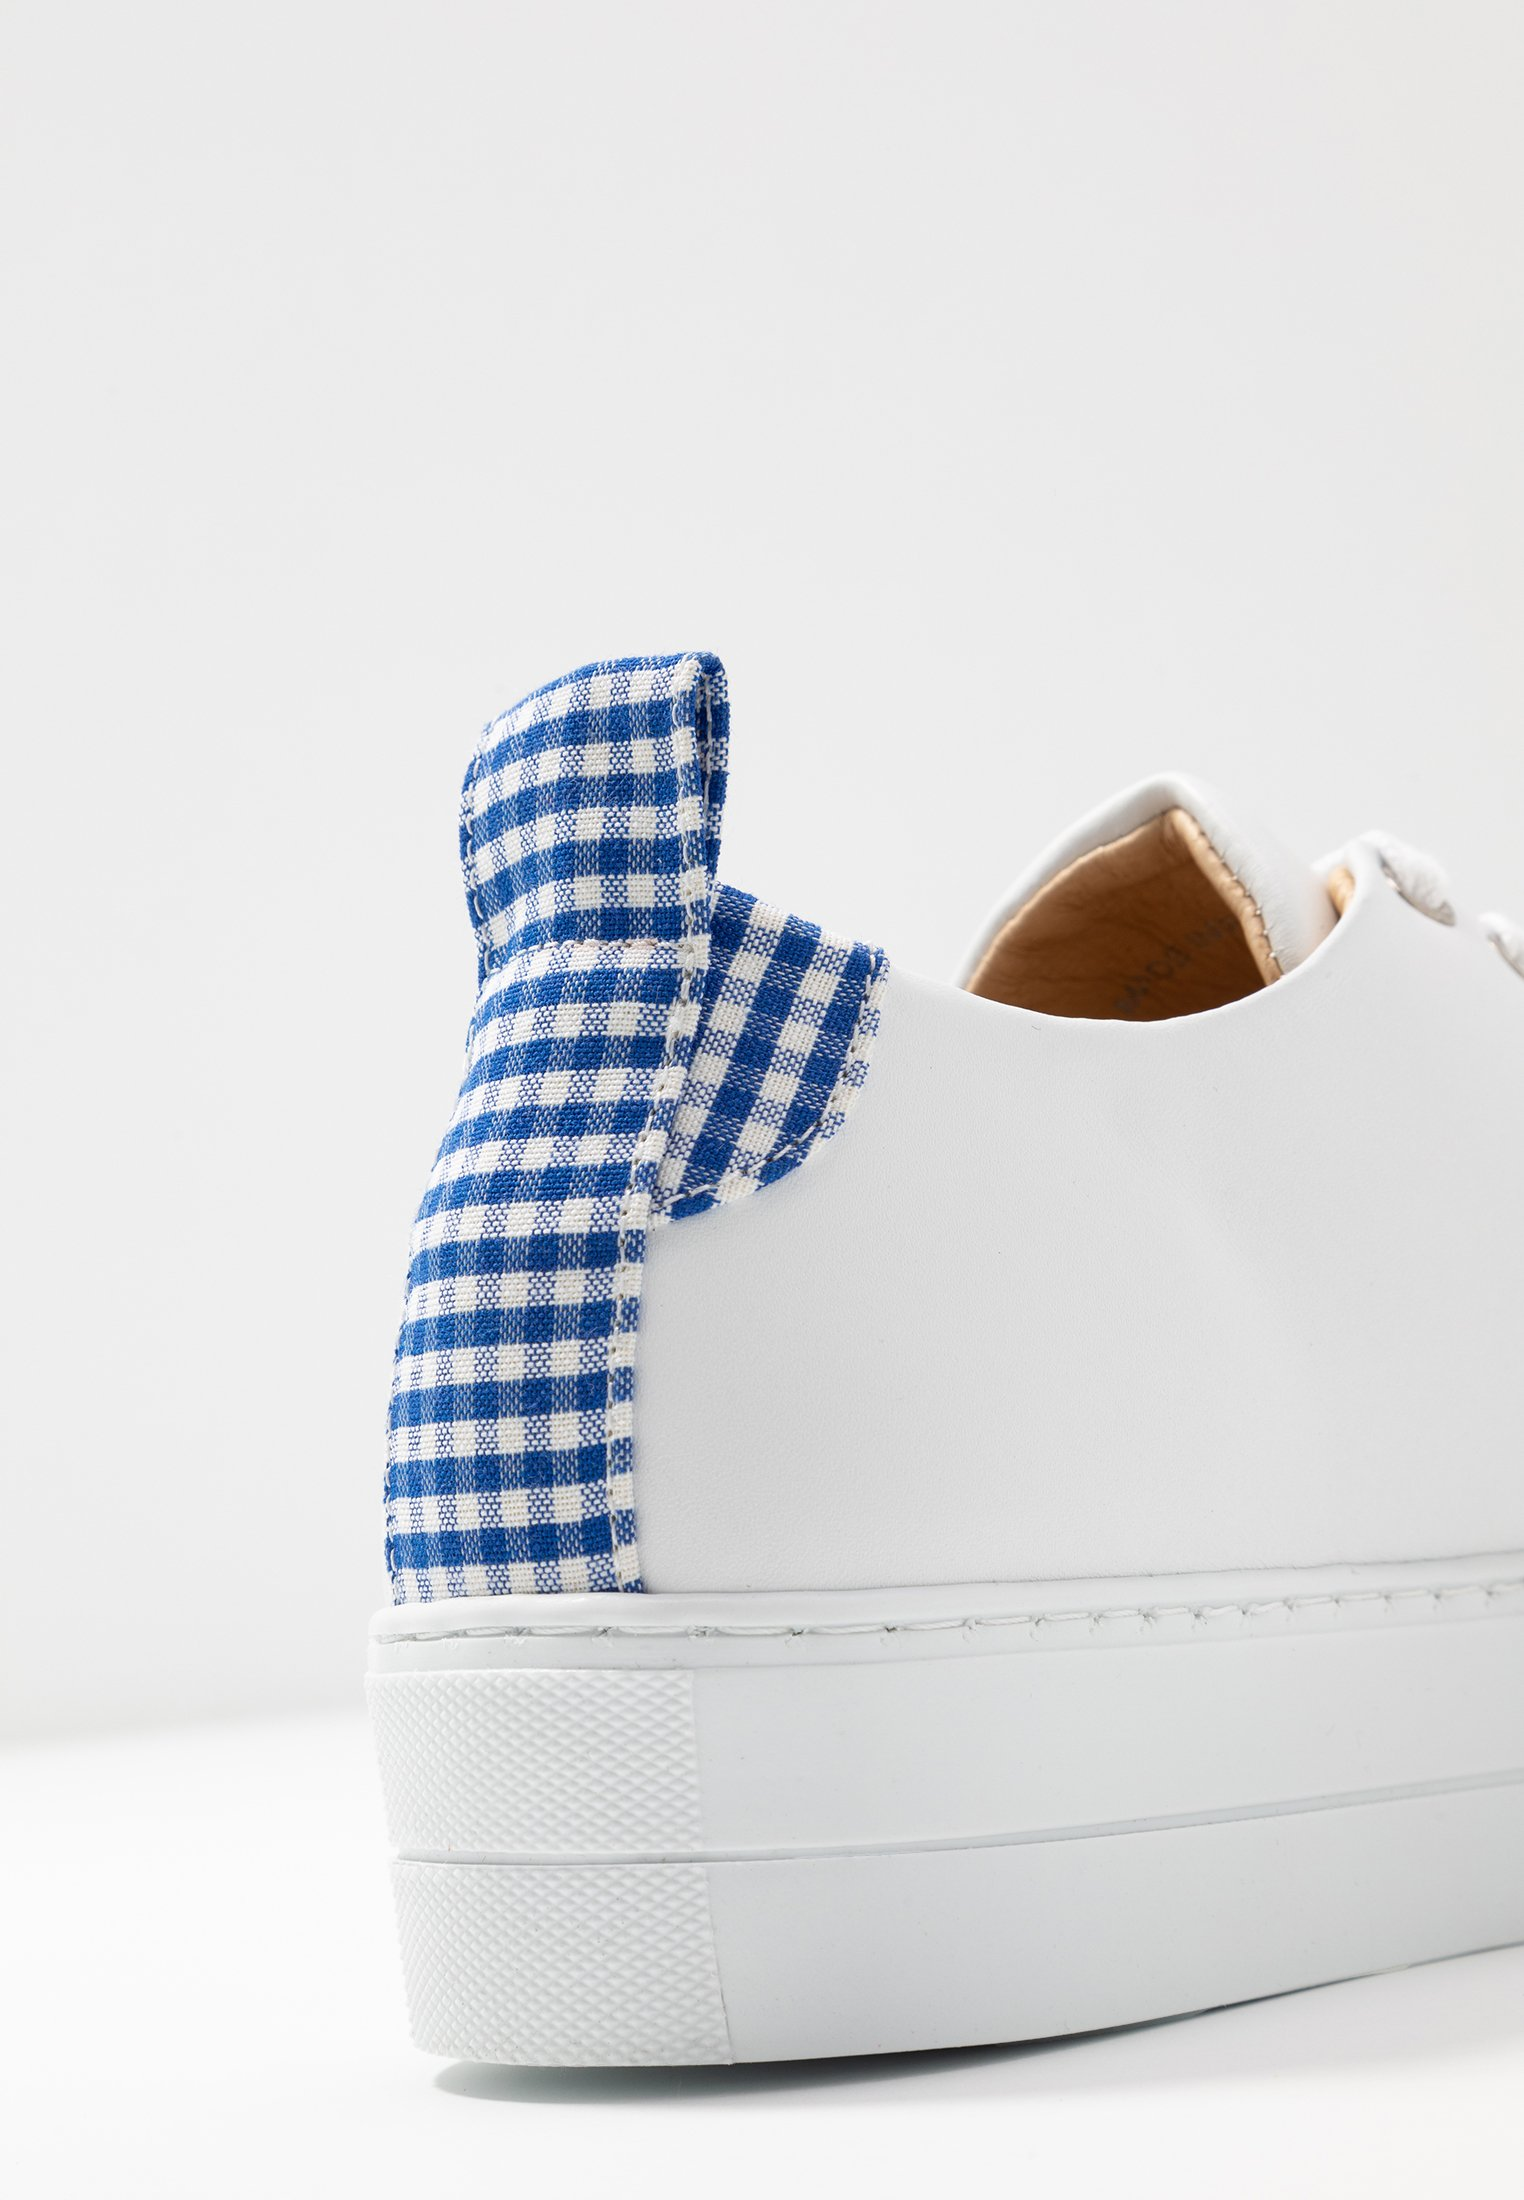 Samsøe Samsøe BURMA 9638 - Sneaker low - white/blu - Black Friday